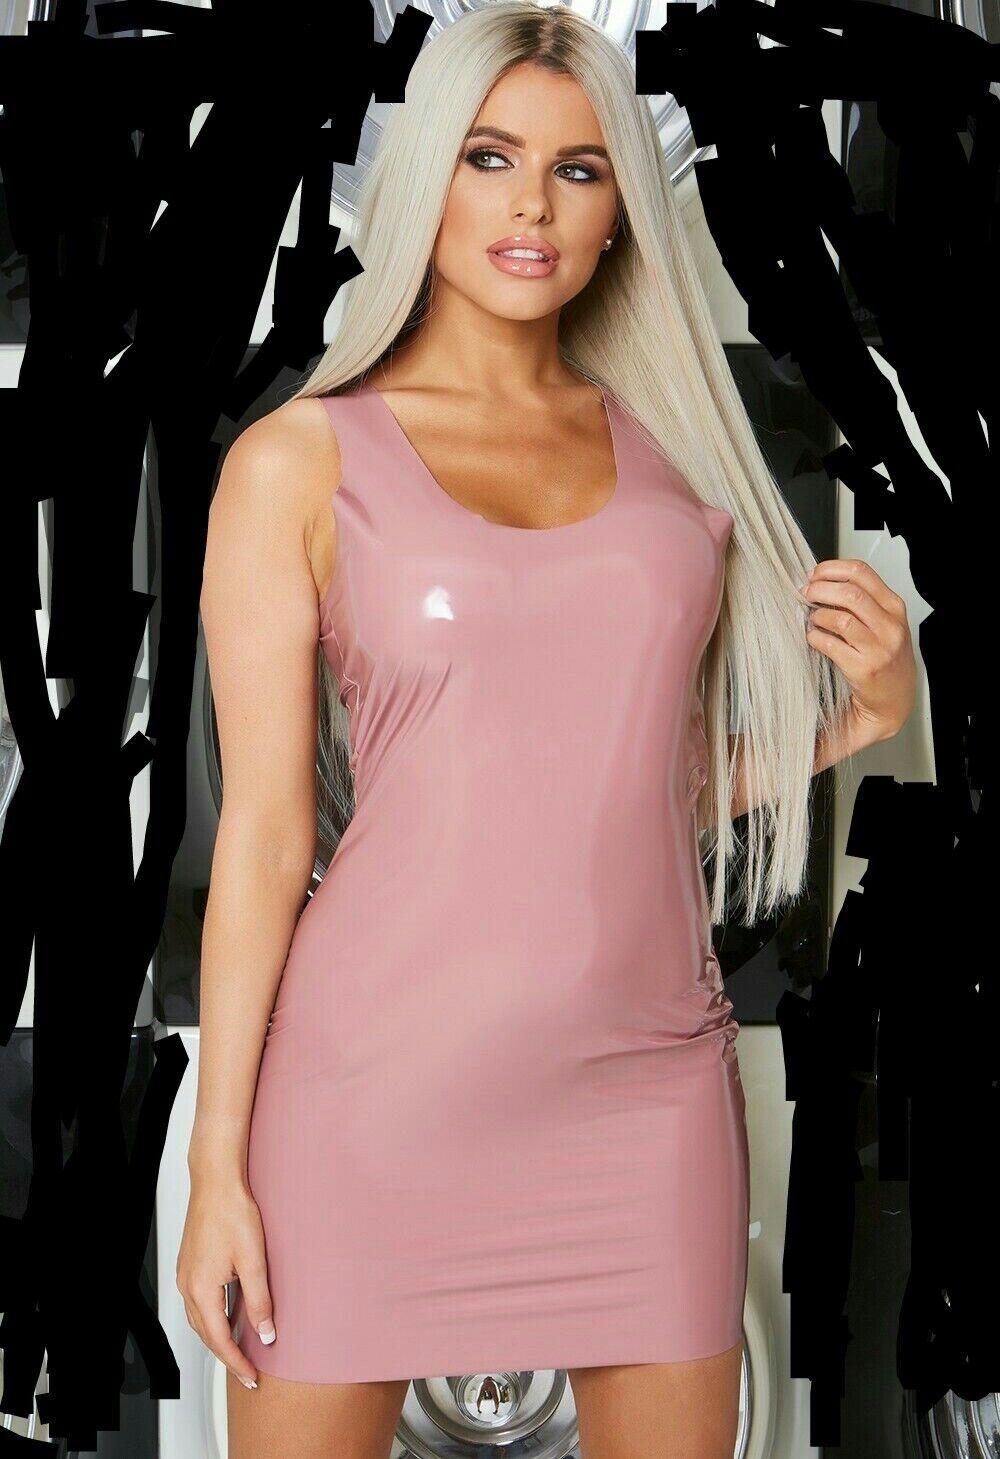 BNWT 8 10 PINK HIGH SHINE VINYL PVC PU WET LOOK WETLOOK BODYCON DRESS